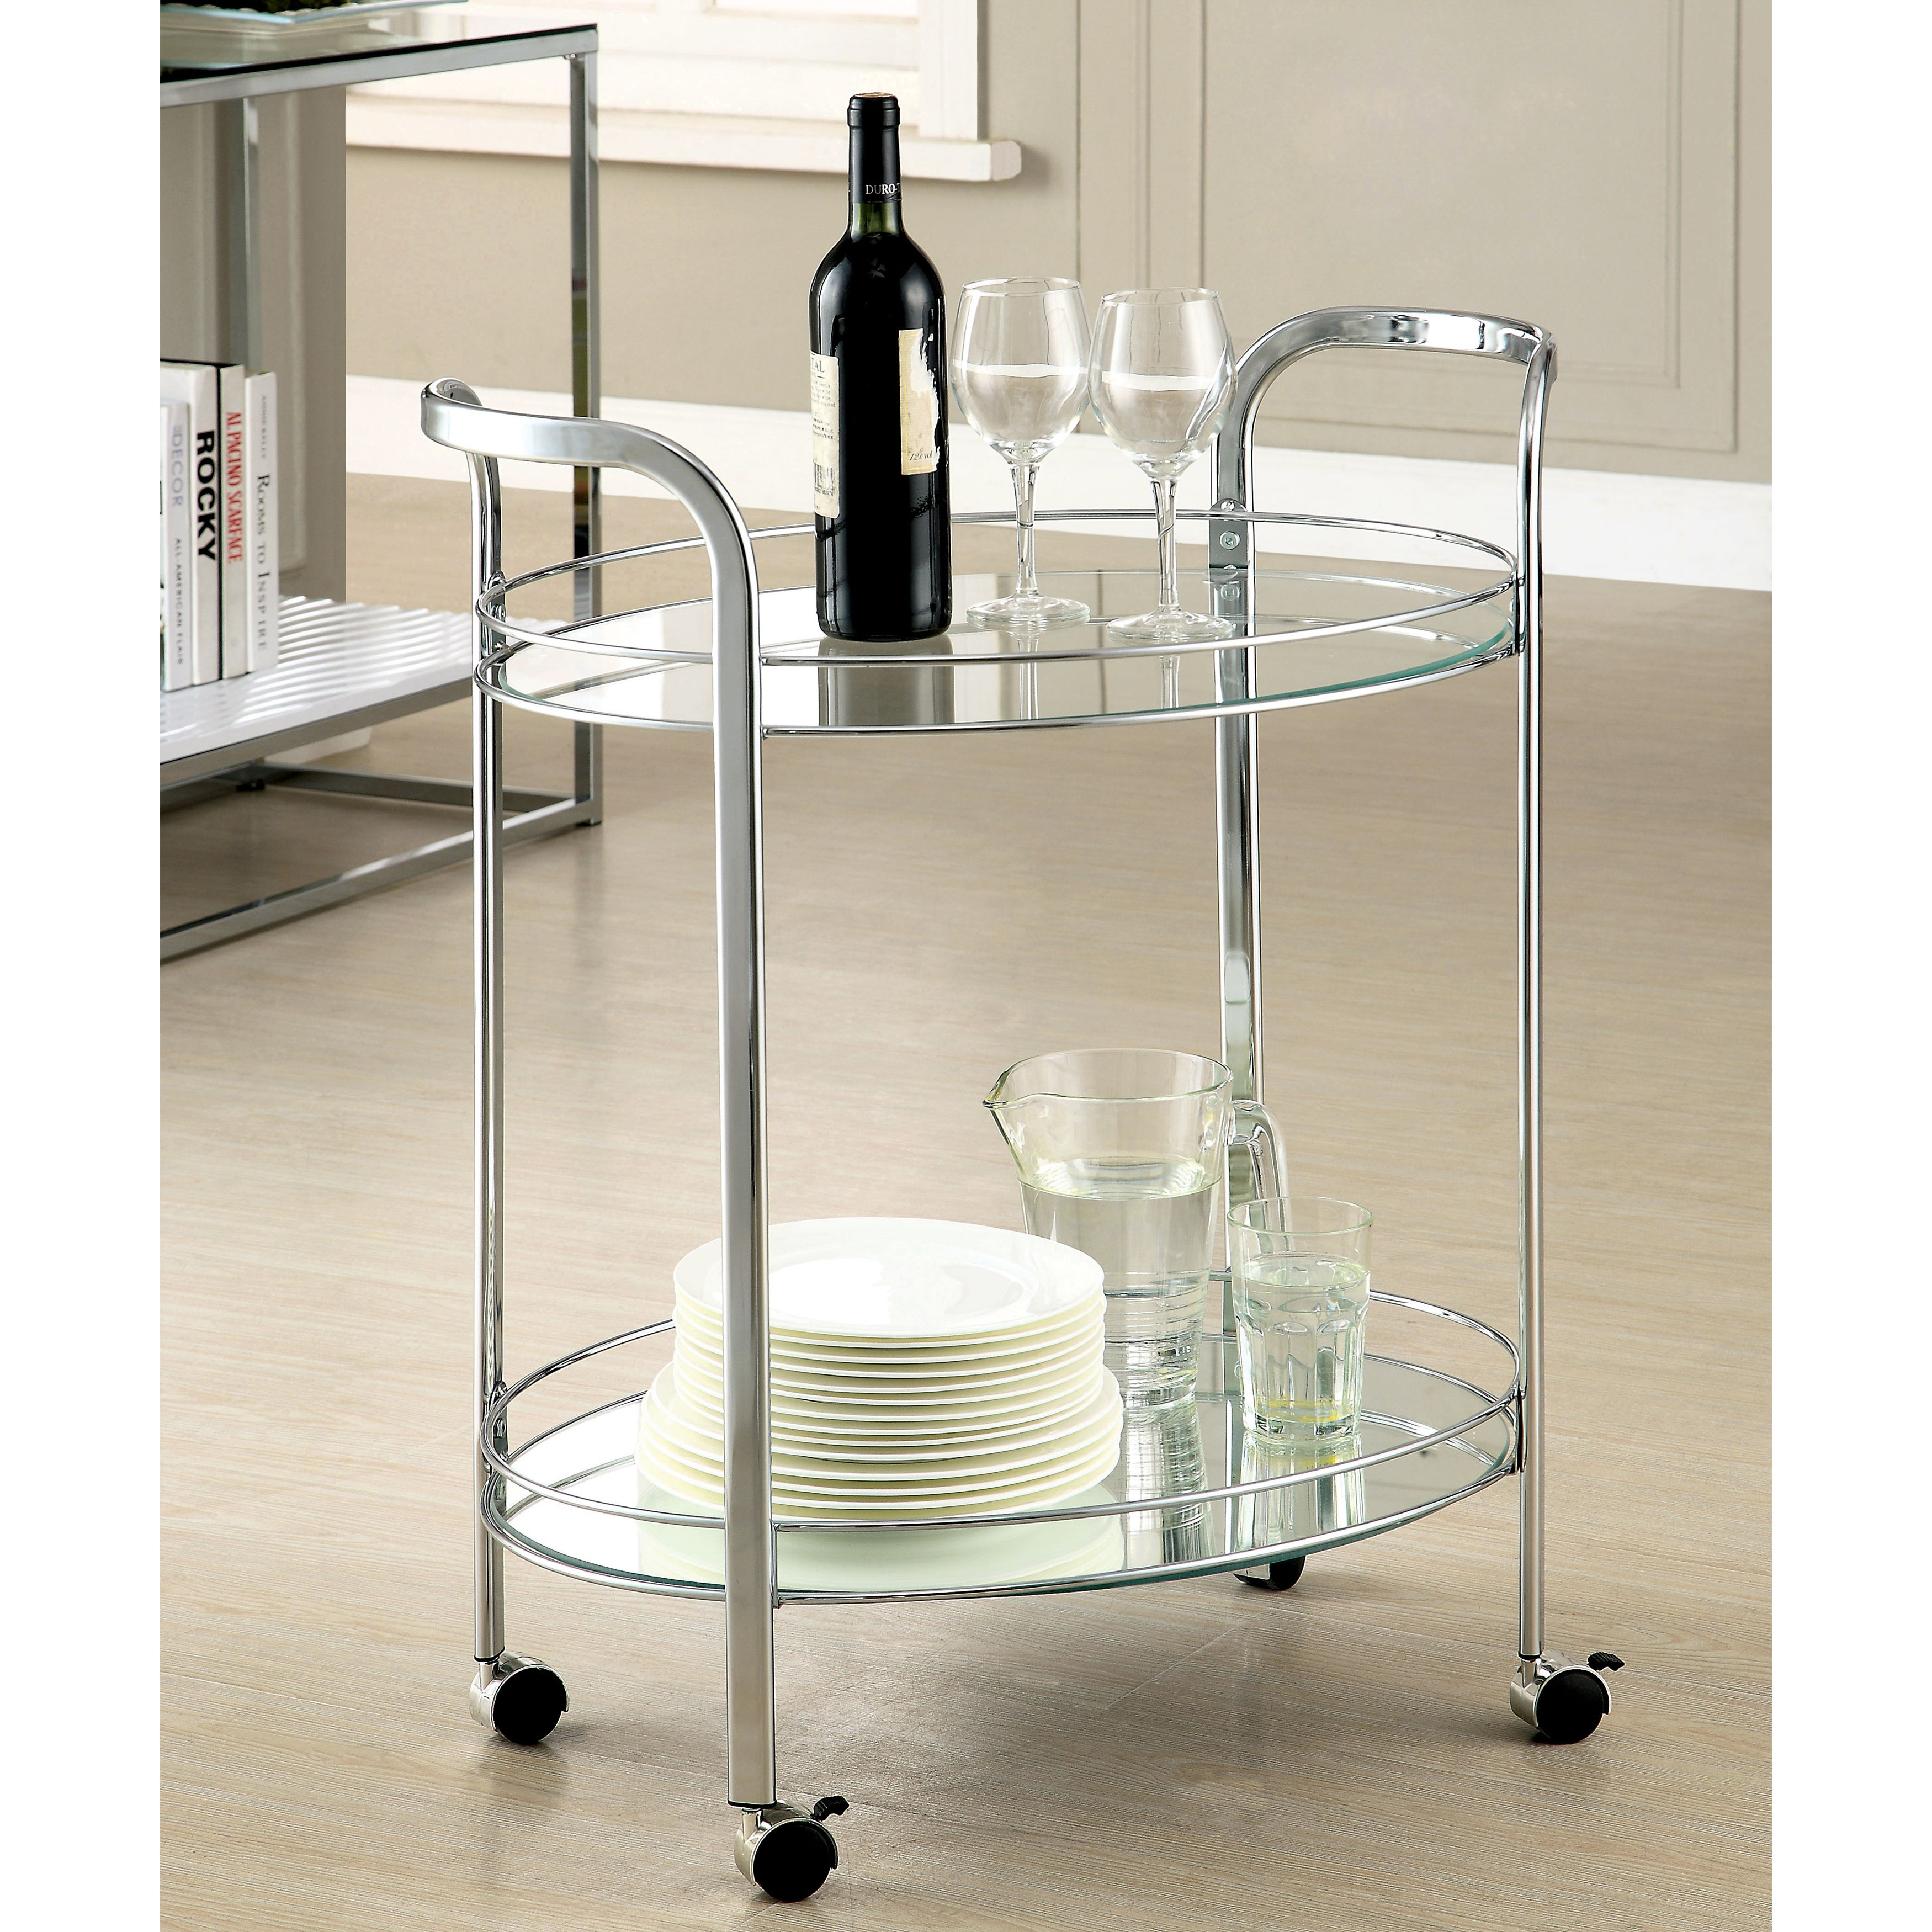 Furniture of America Teliza Contemporary Chrome 2-Shelf S...